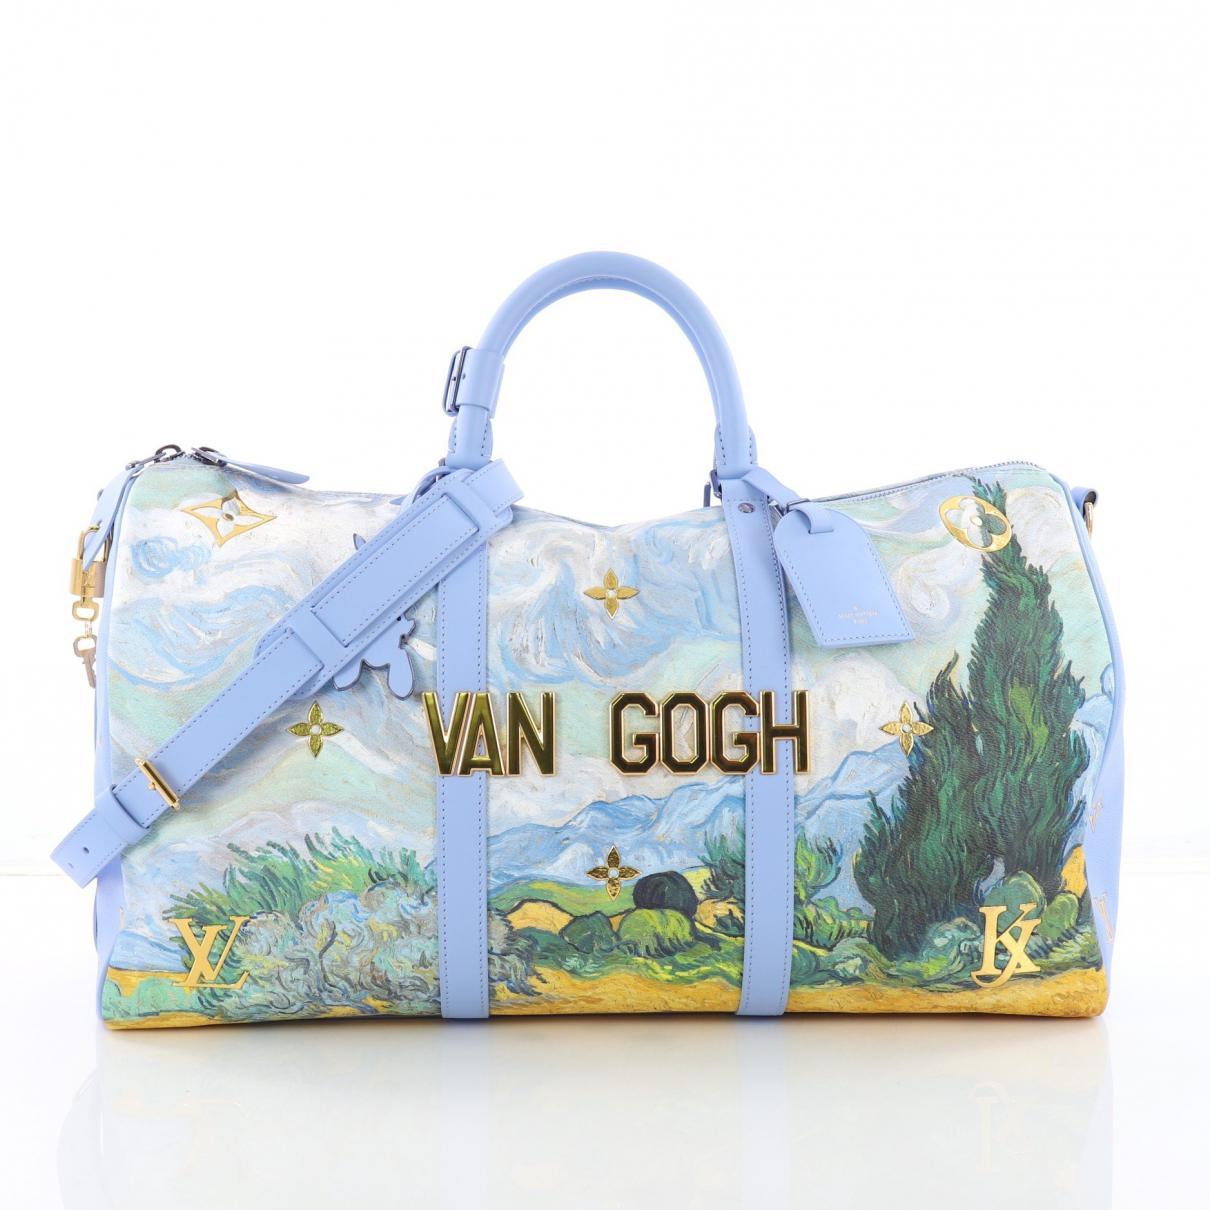 f4e11632577d Louis Vuitton Keepall Bandouliere Bag Limited Edition Jeff Koons Van ...